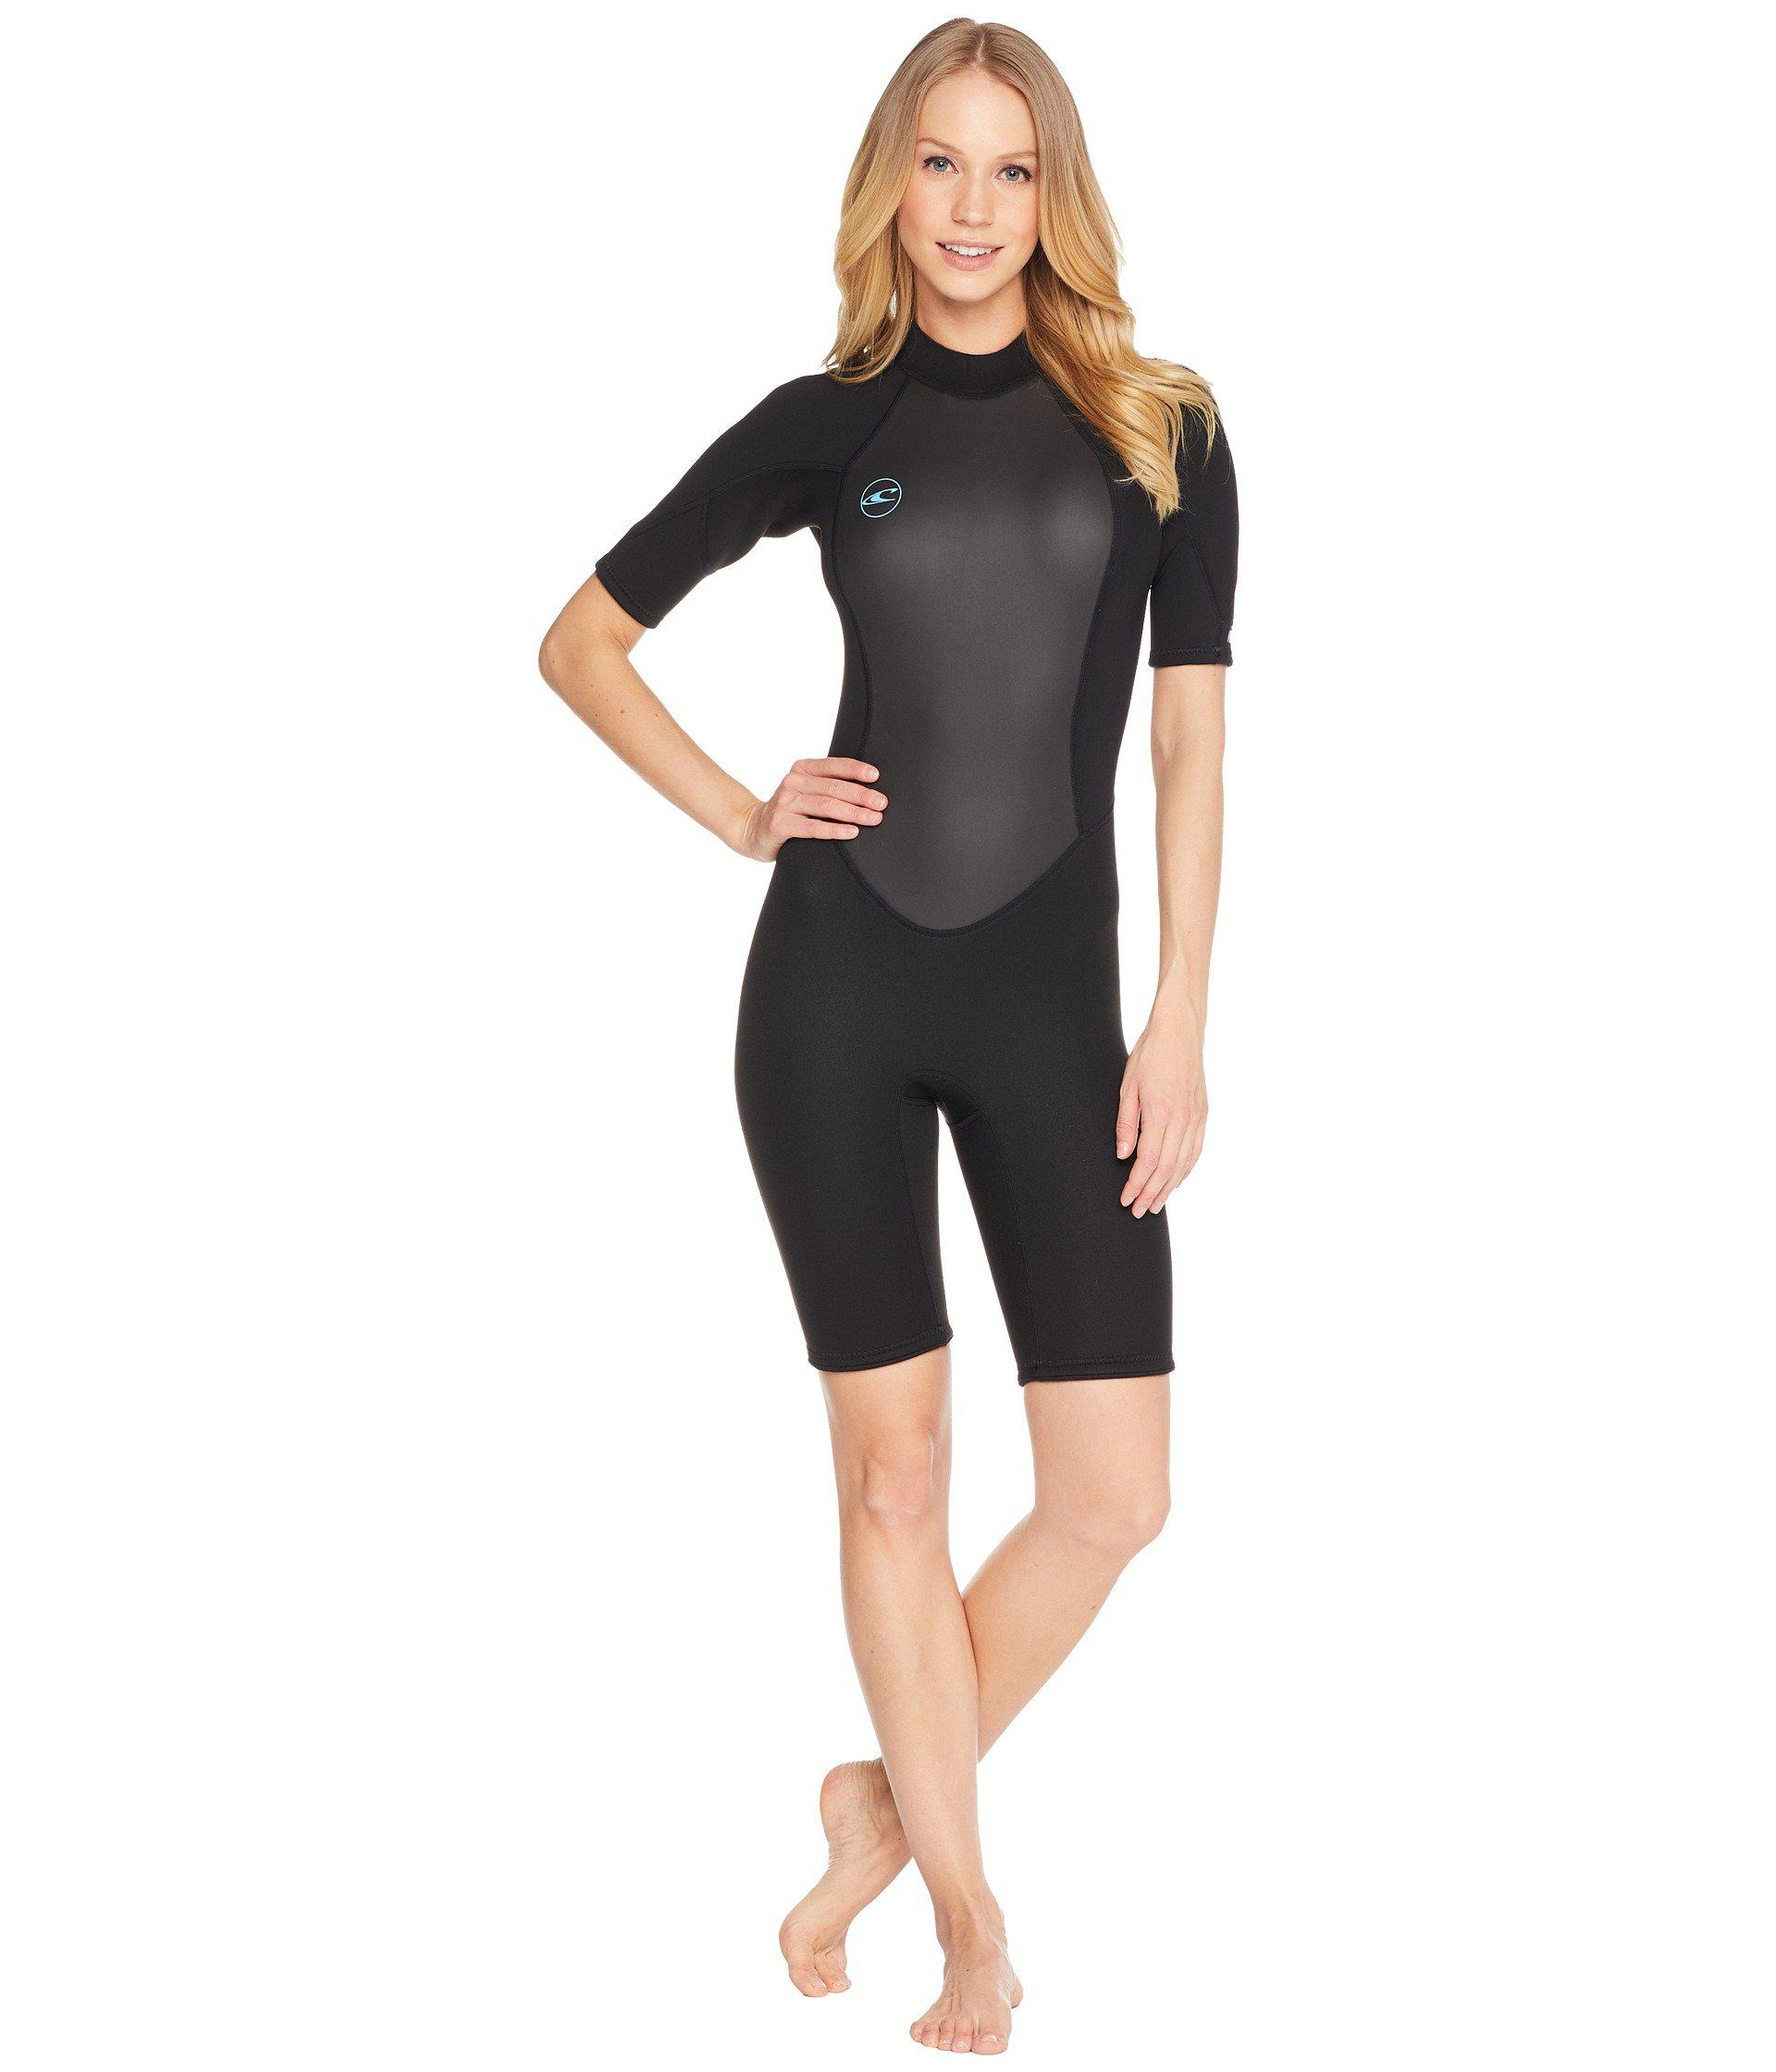 6b66b33ada O'neill Sportswear Reactor-2 2mm Back Zip Short Sleeve (black/black ...